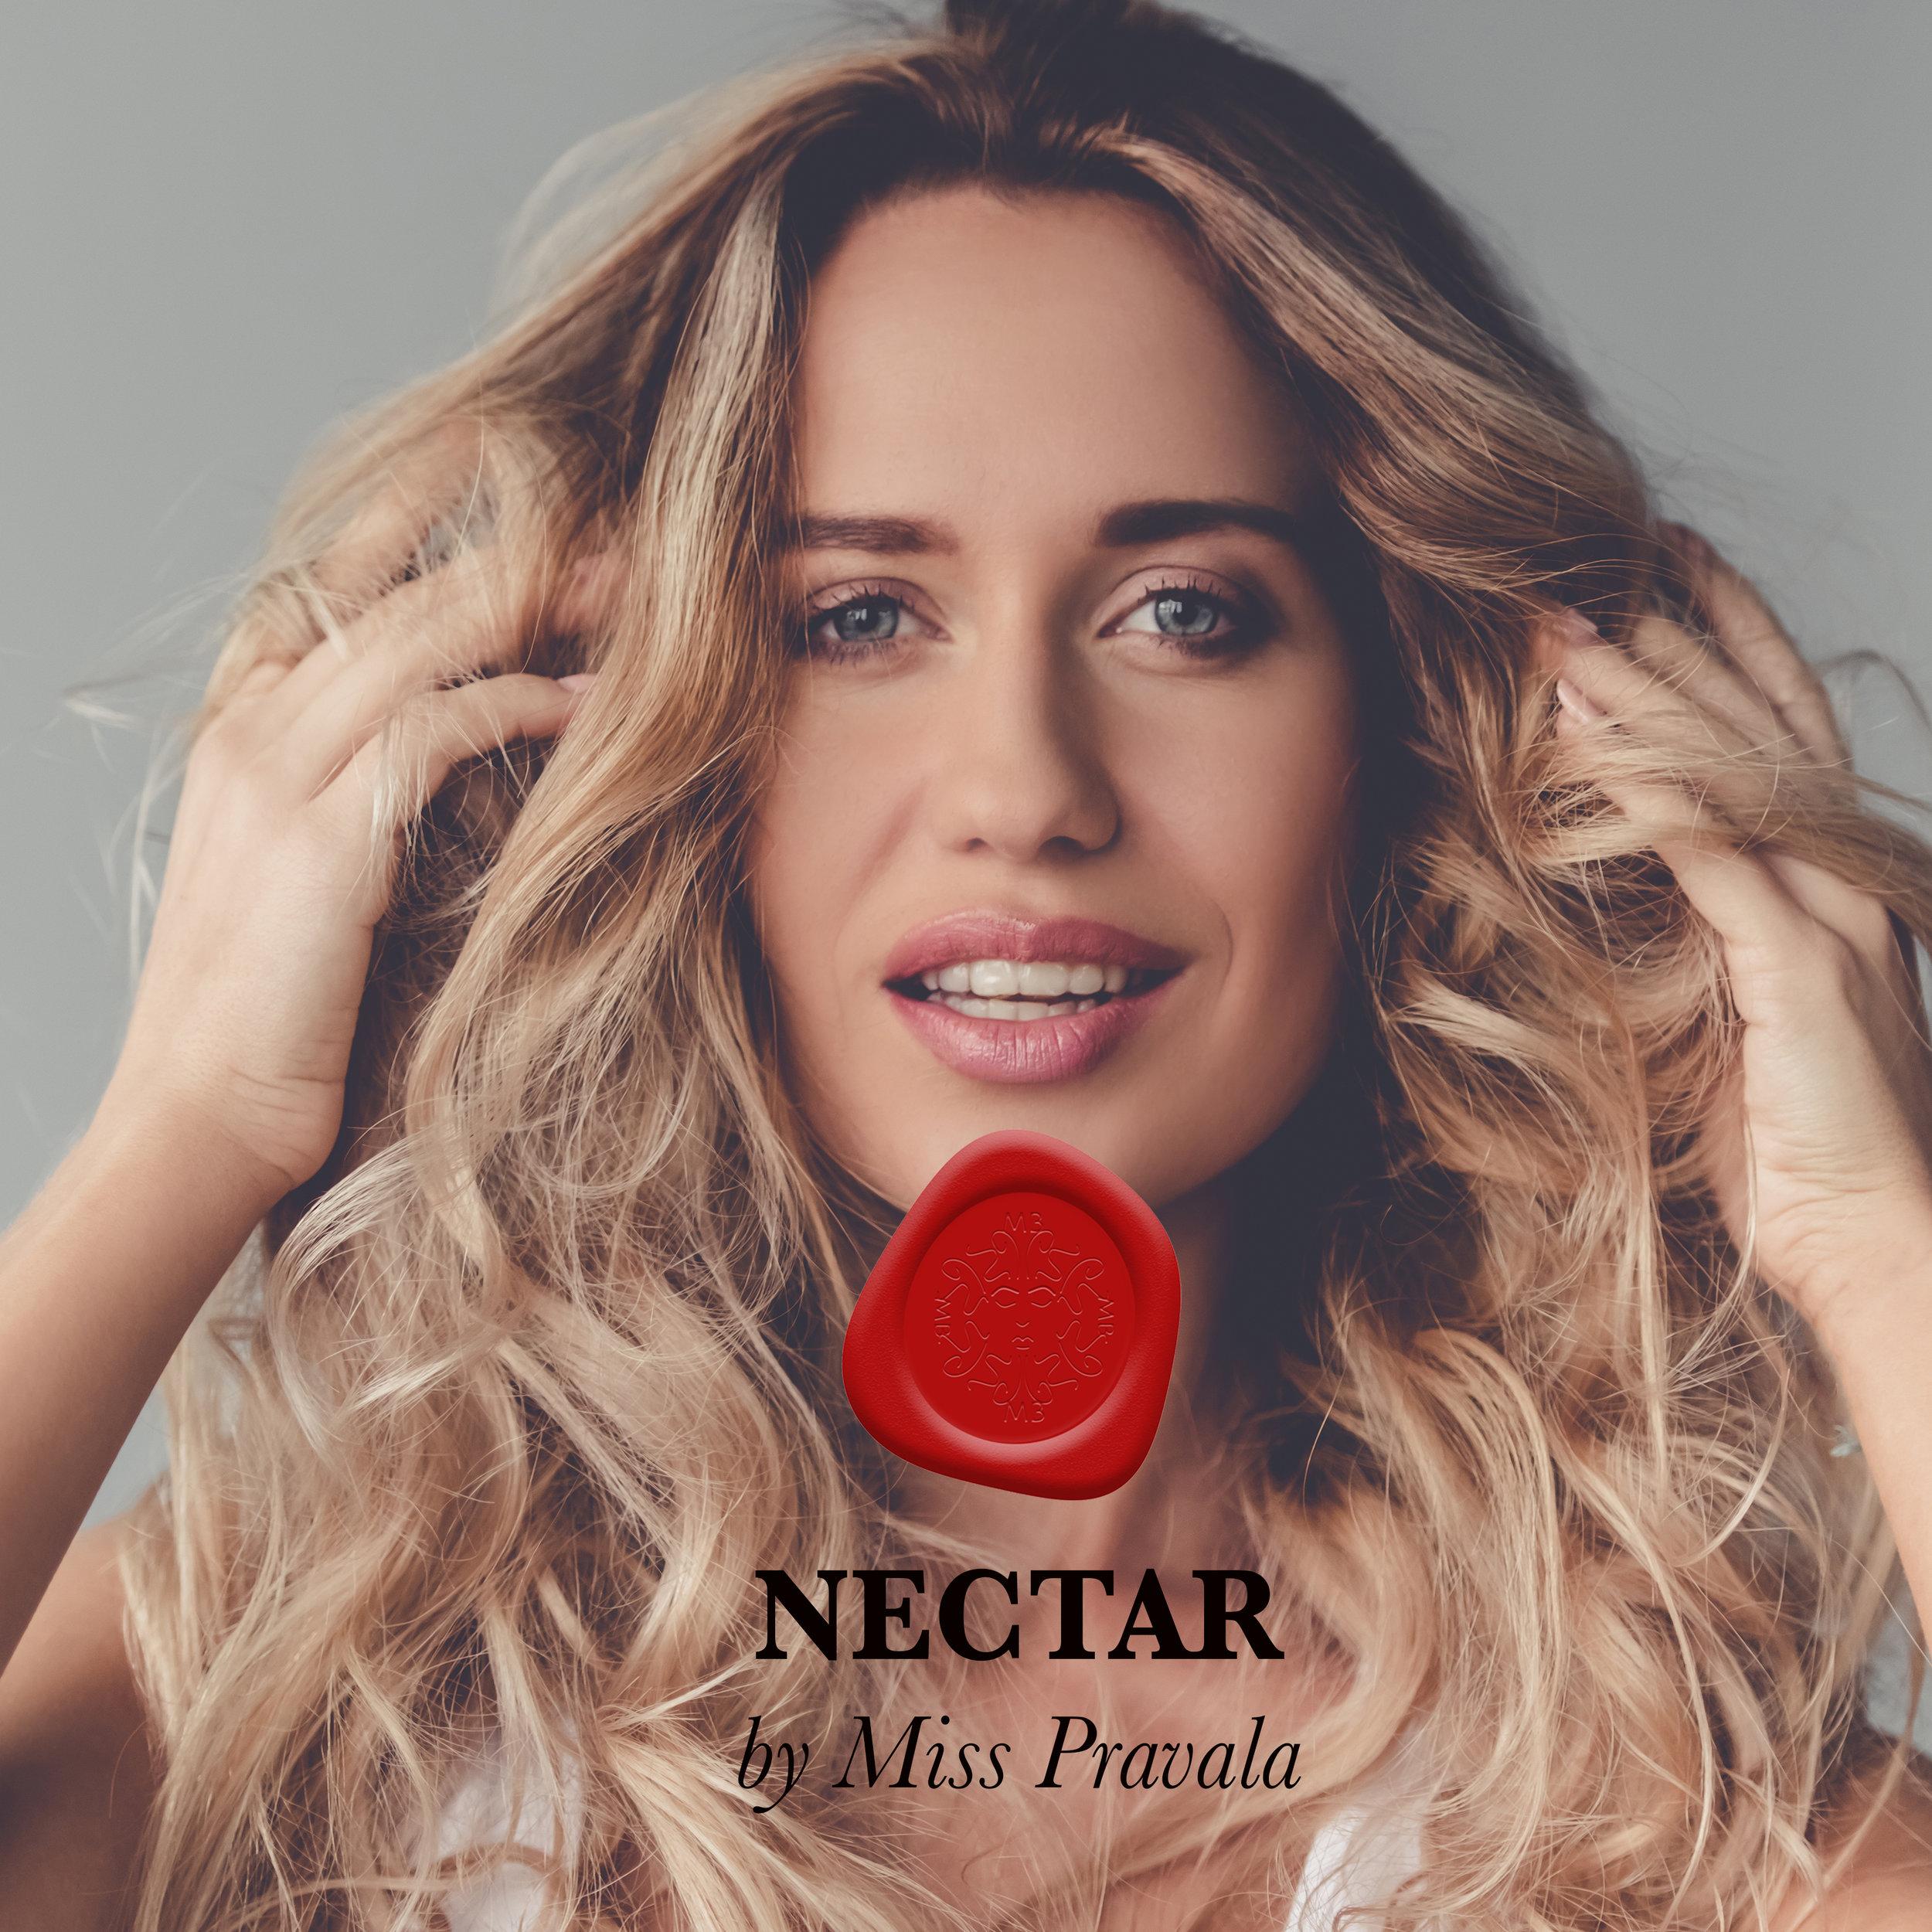 nectar by MP 1.jpg